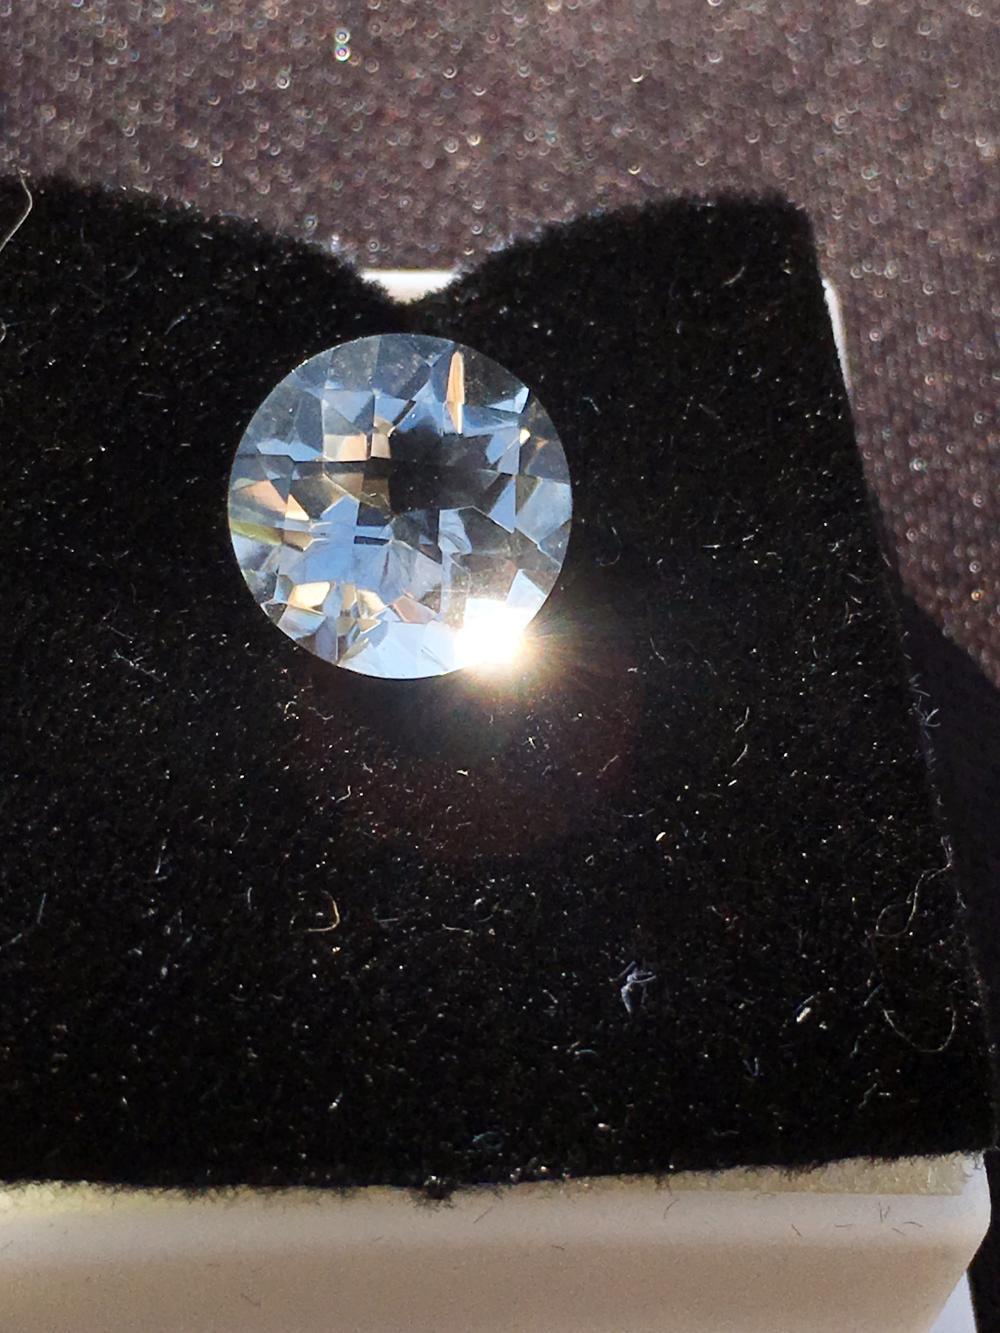 Lot 243: Quartz, Rock, Crystal, Natural, Gemstone, Jewelry